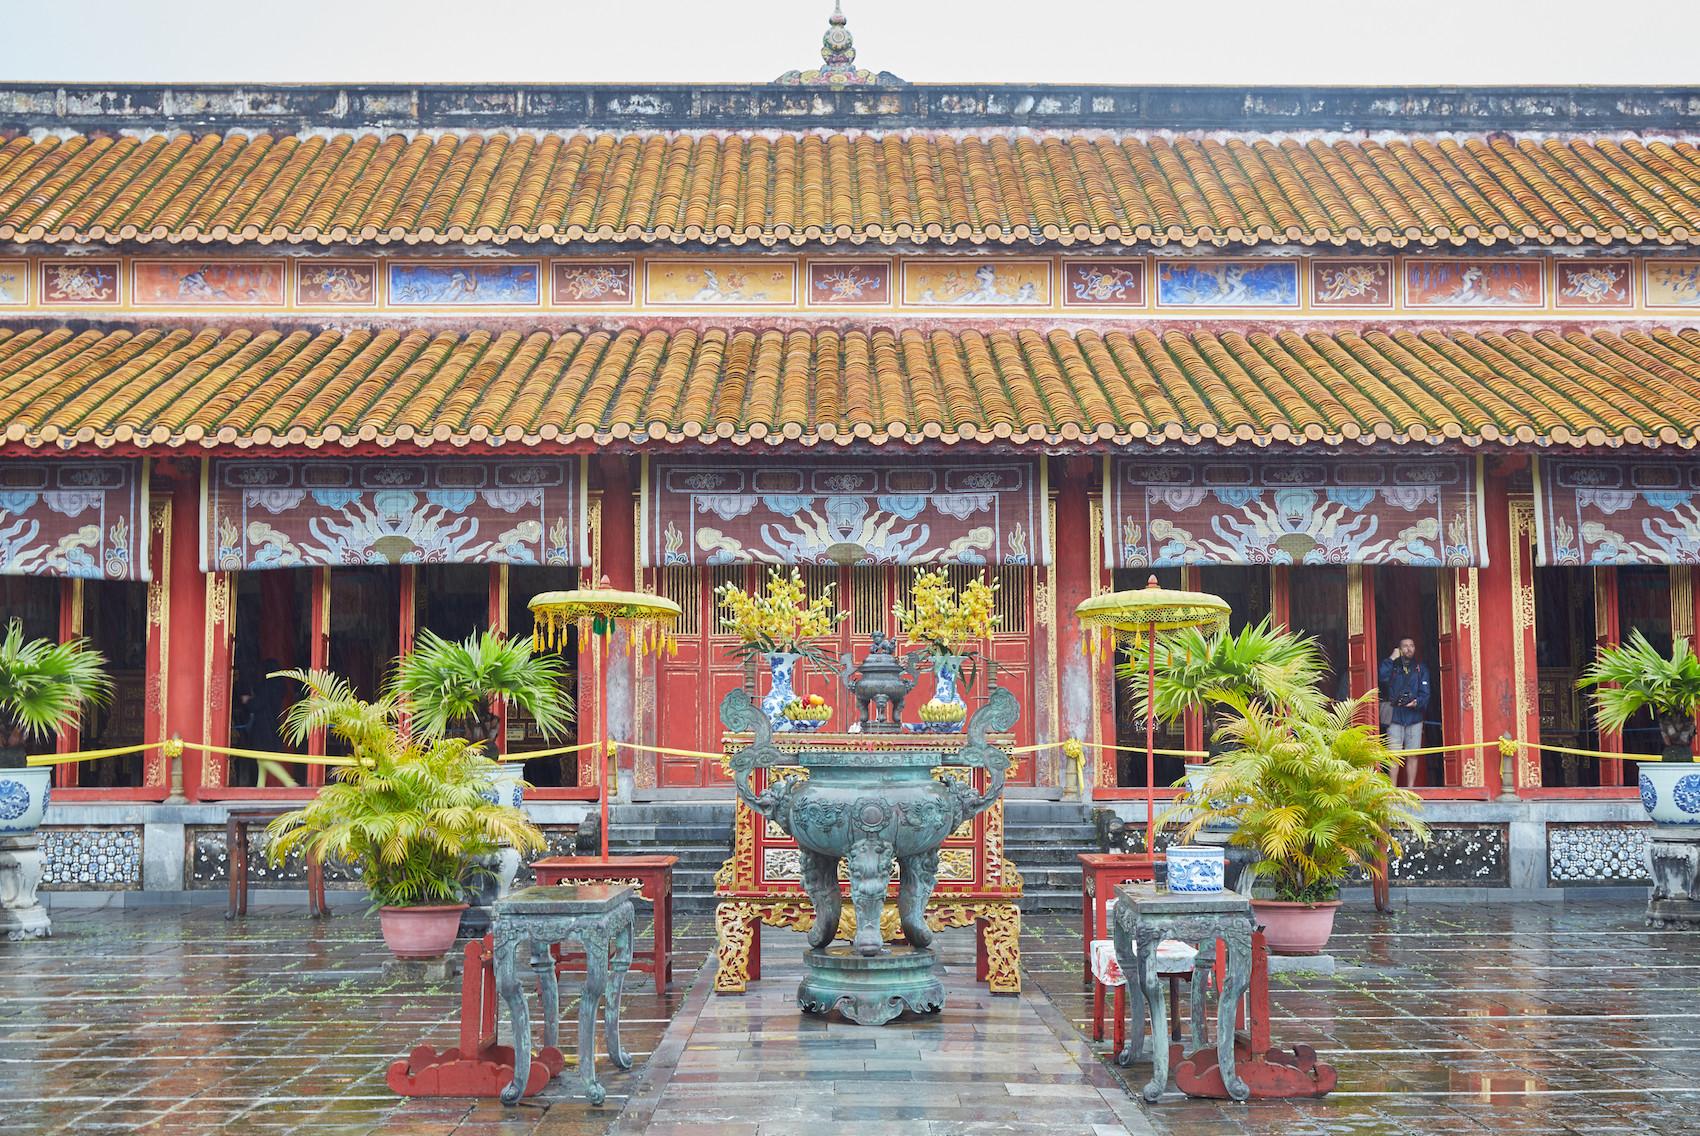 The To Mieu Temple Hue